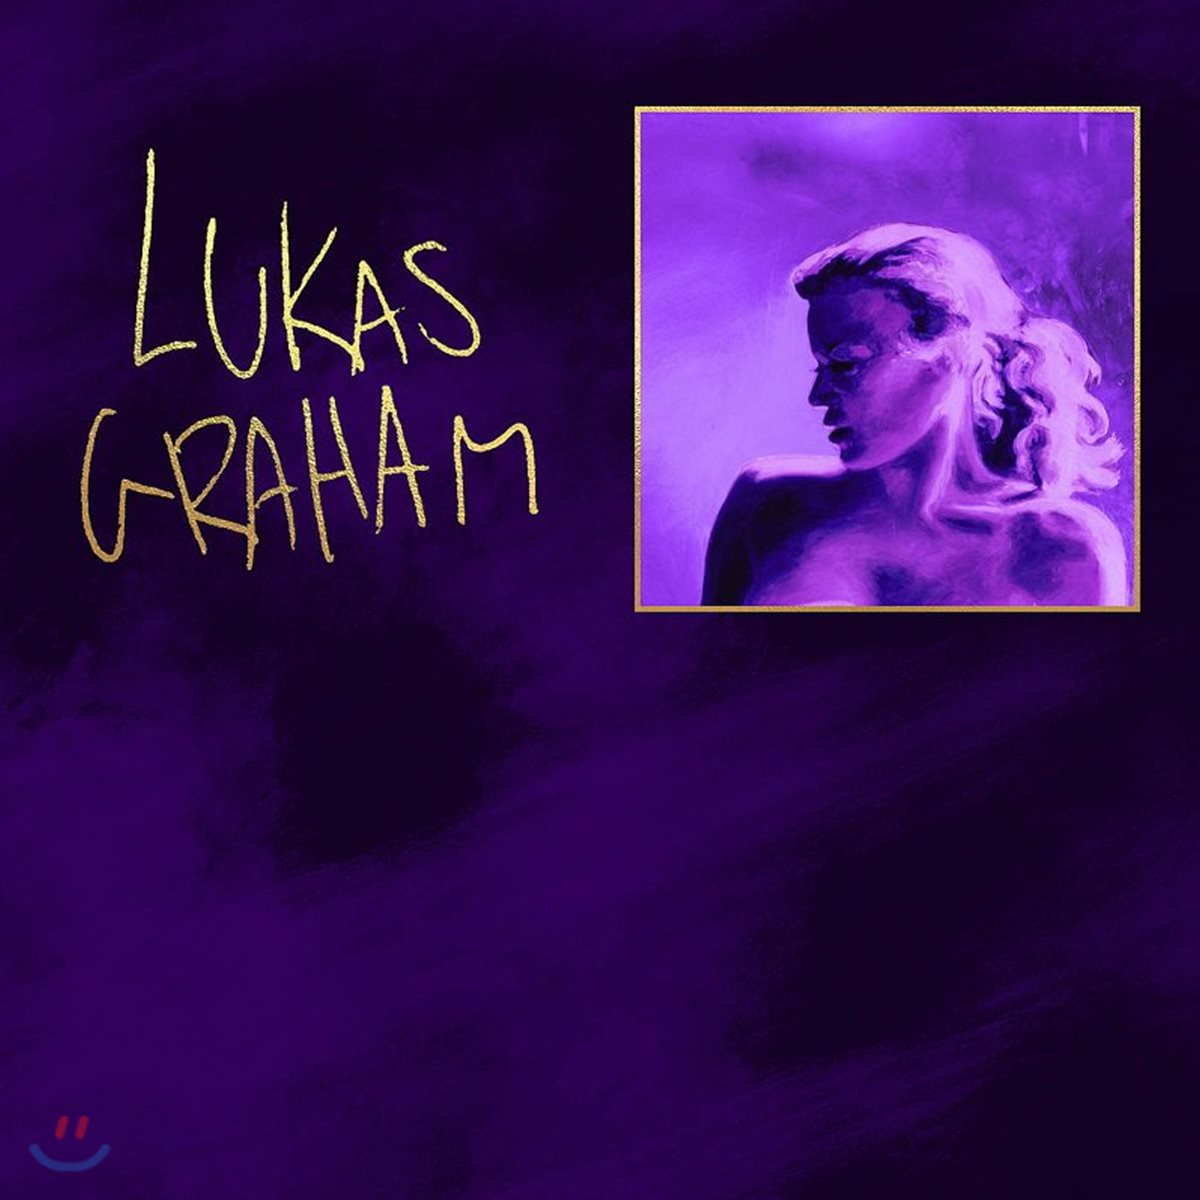 Lukas Graham - 3 (Purple Album) 루카스 그레이엄 3집